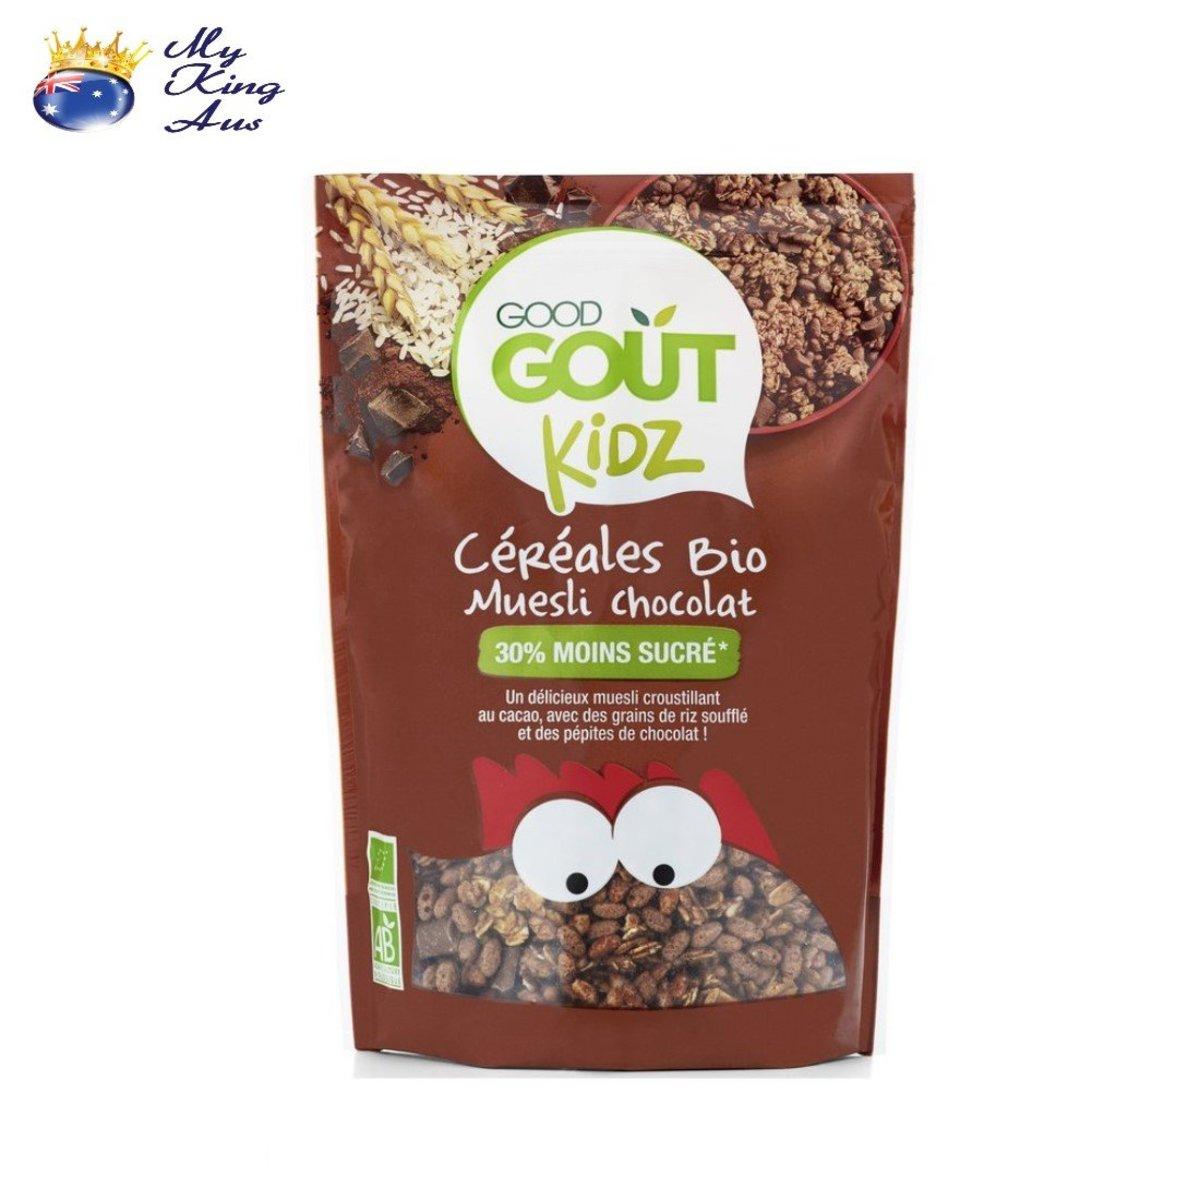 Organic Cereal Chocolate Muesli 300g